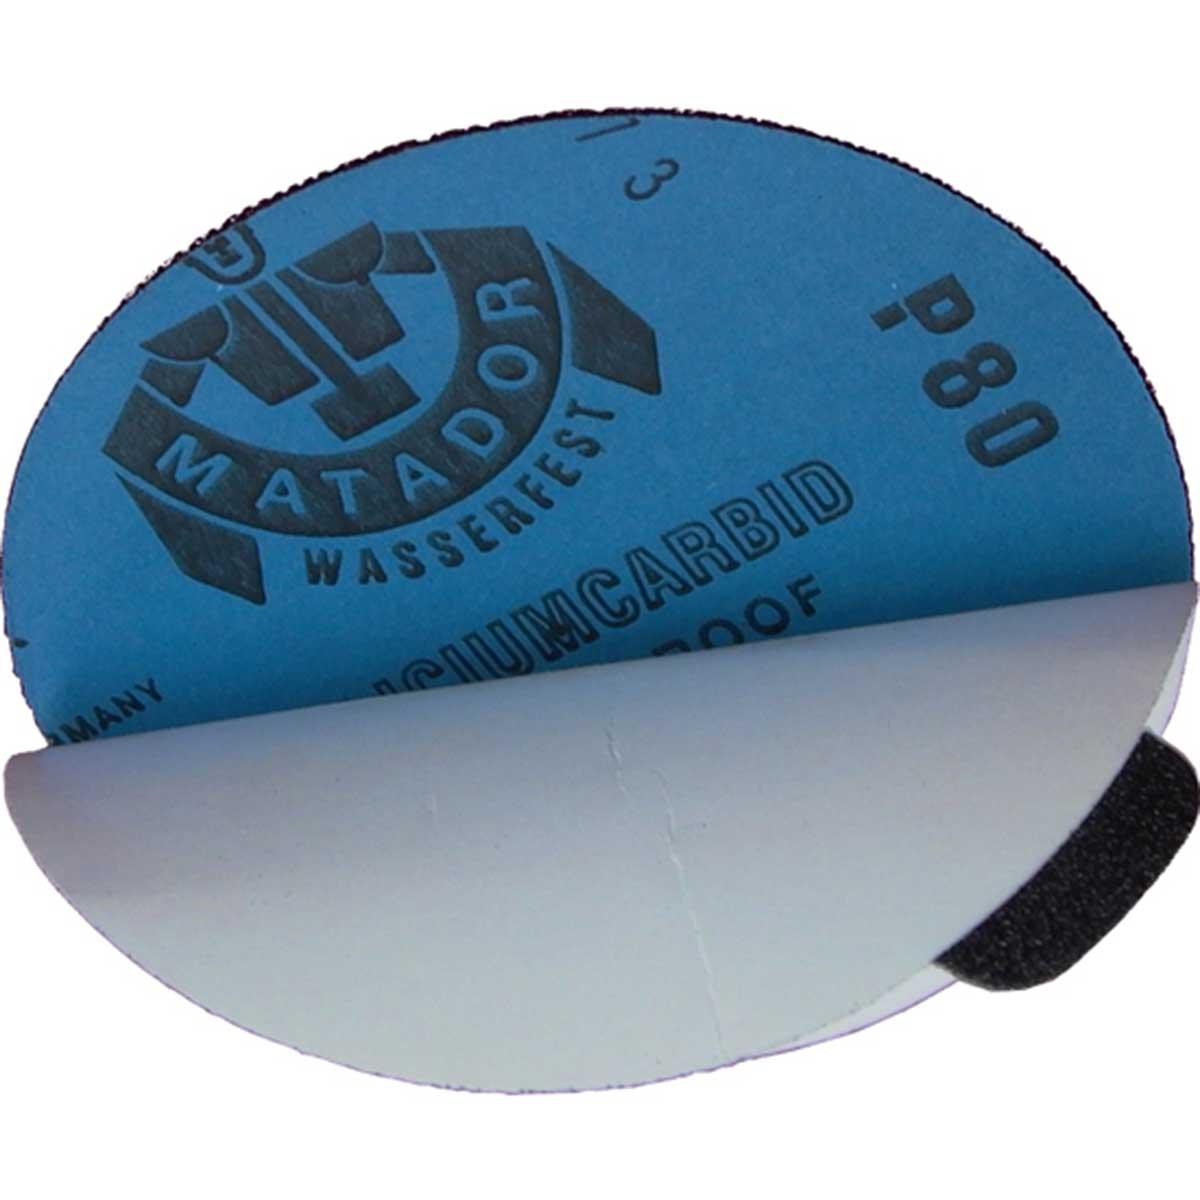 5 inch Waterproof PSA Sandpaper for Stone Polishing